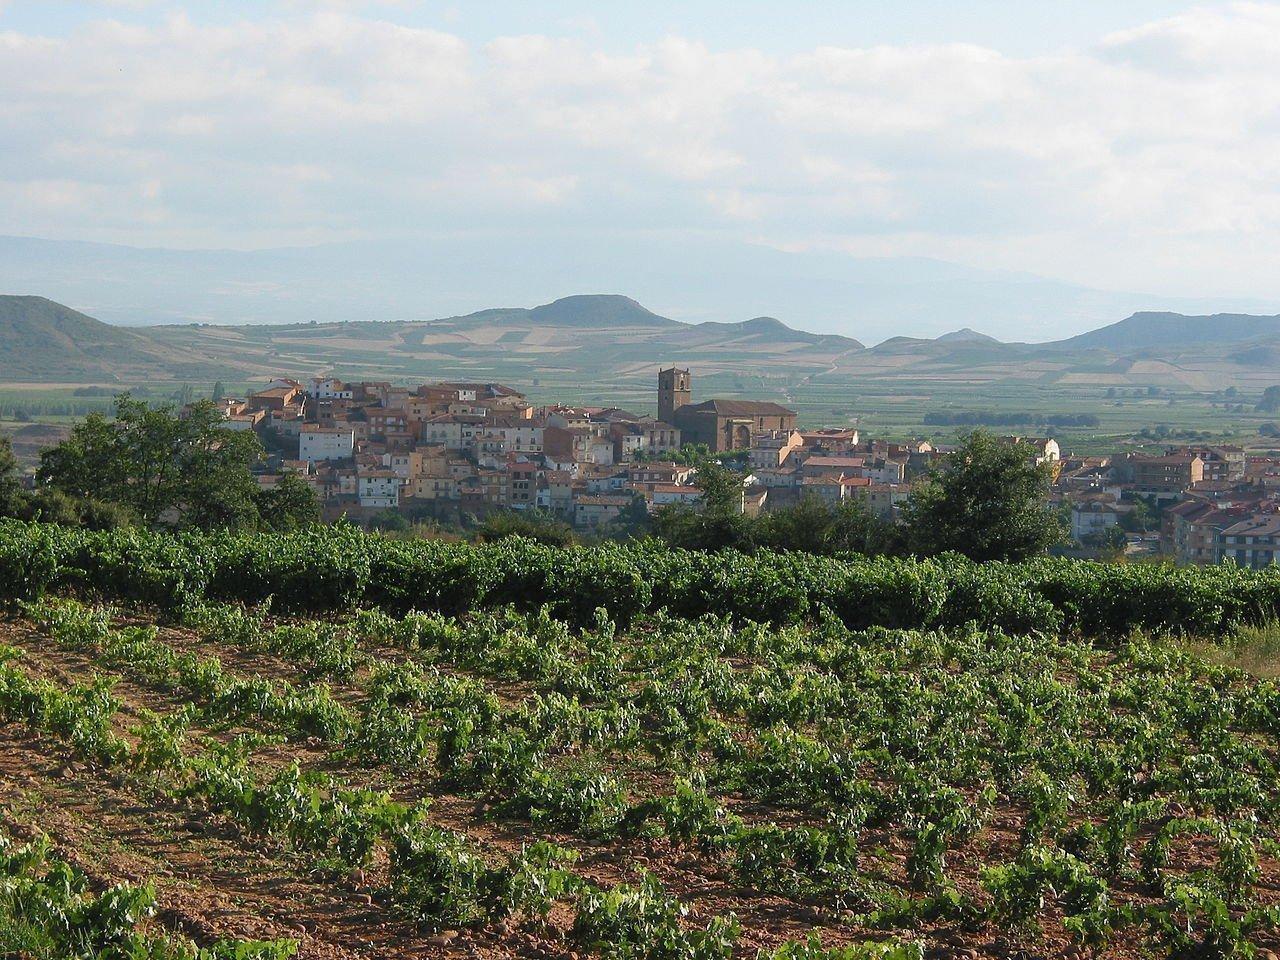 La Rioja wine region, Spain | ©Gurrea / Wikimedia Commons